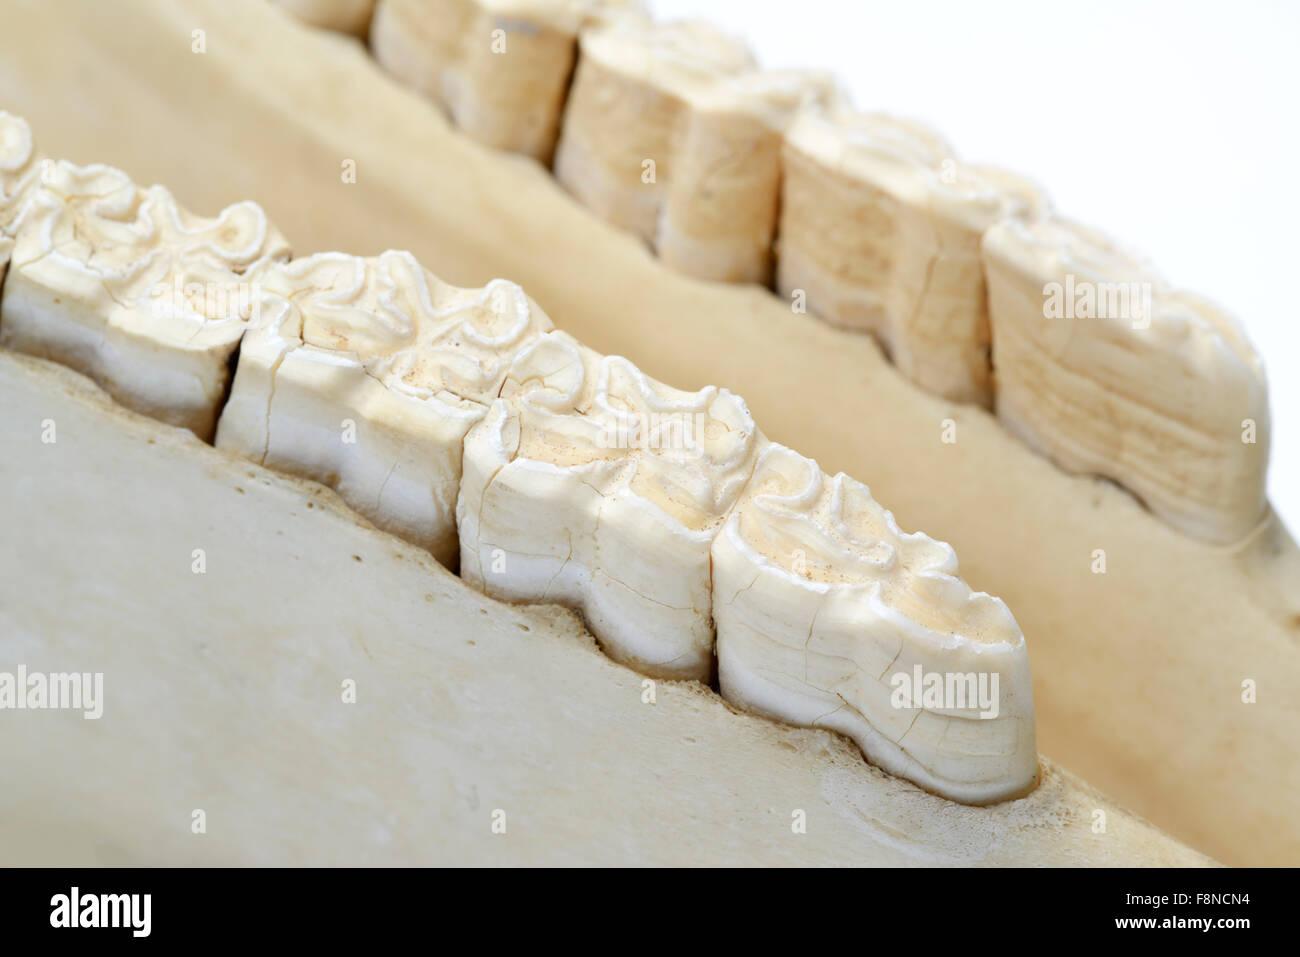 Row of molar teeth in lower jaw of a horse, Equus ferus caballus - Stock Image